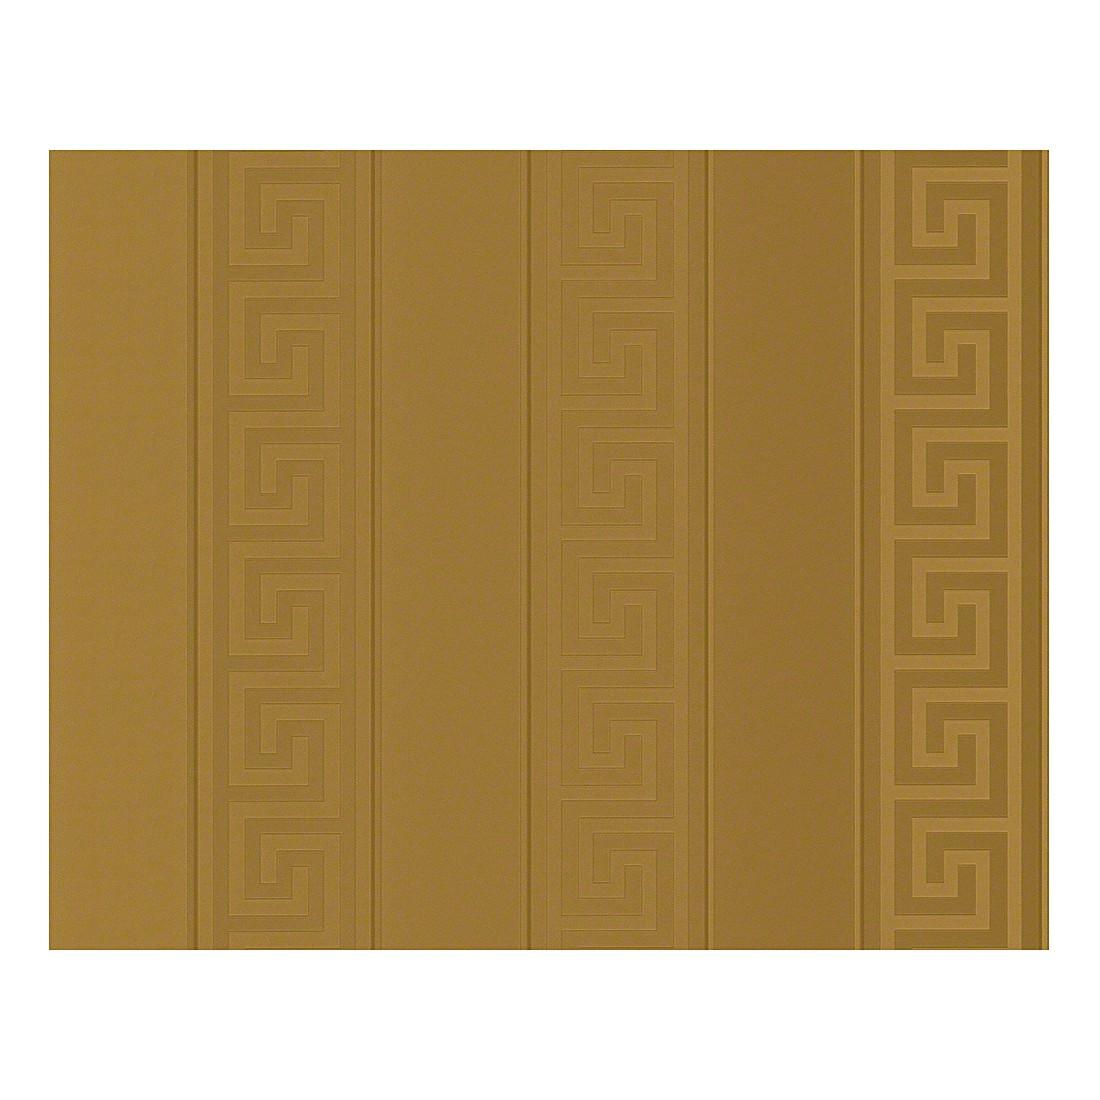 Tapete Greek – goldfarben – fein strukturiert – glatt – Modell 1, VERSACE Home online bestellen